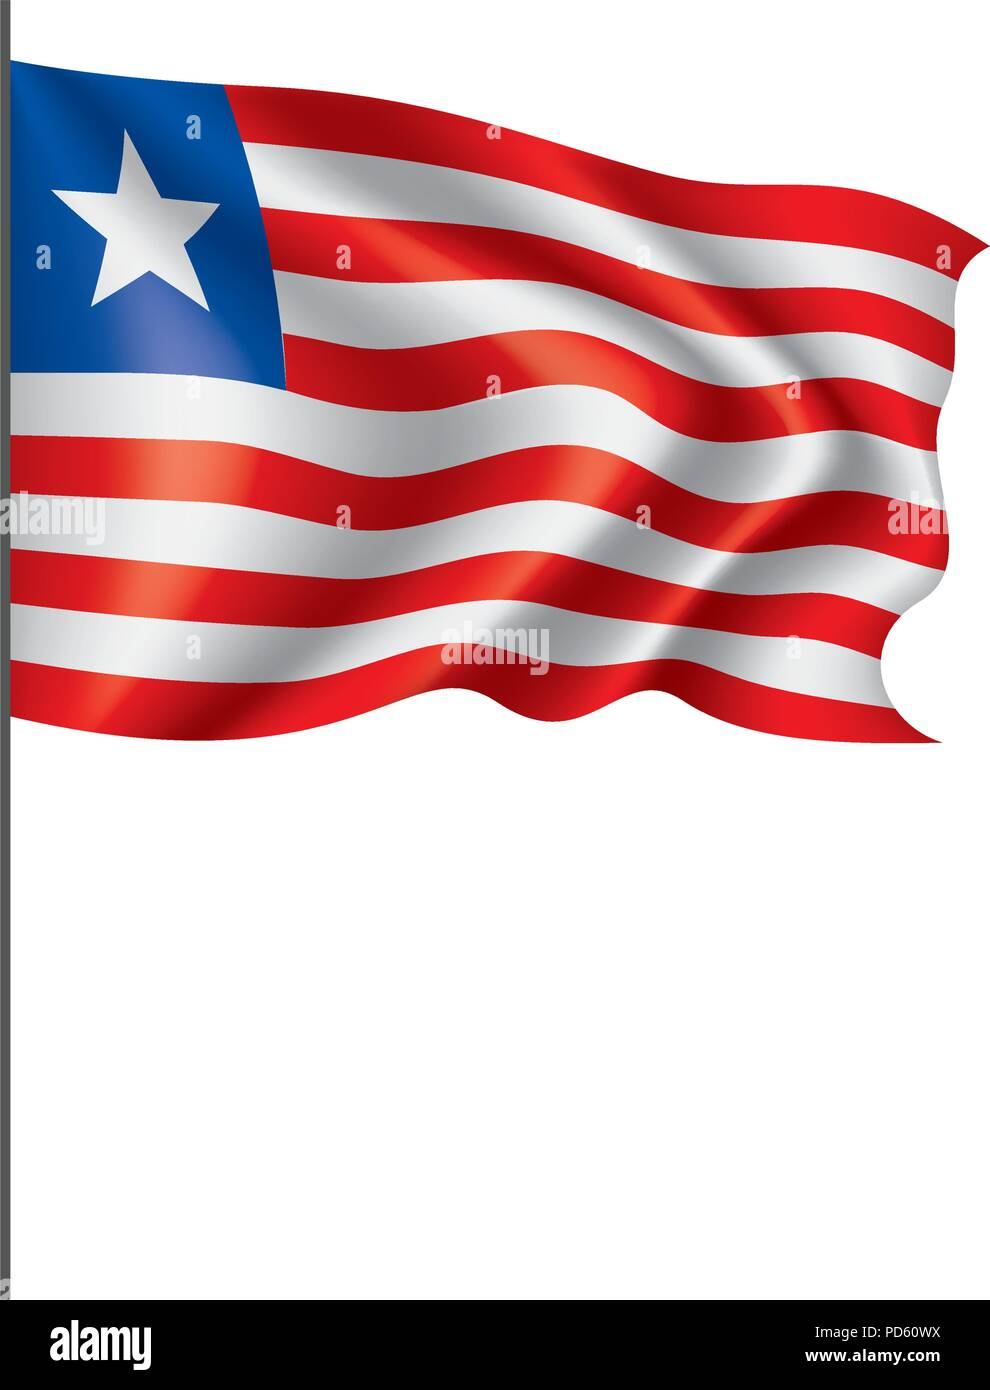 Liberia flag, vector illustration - Stock Image